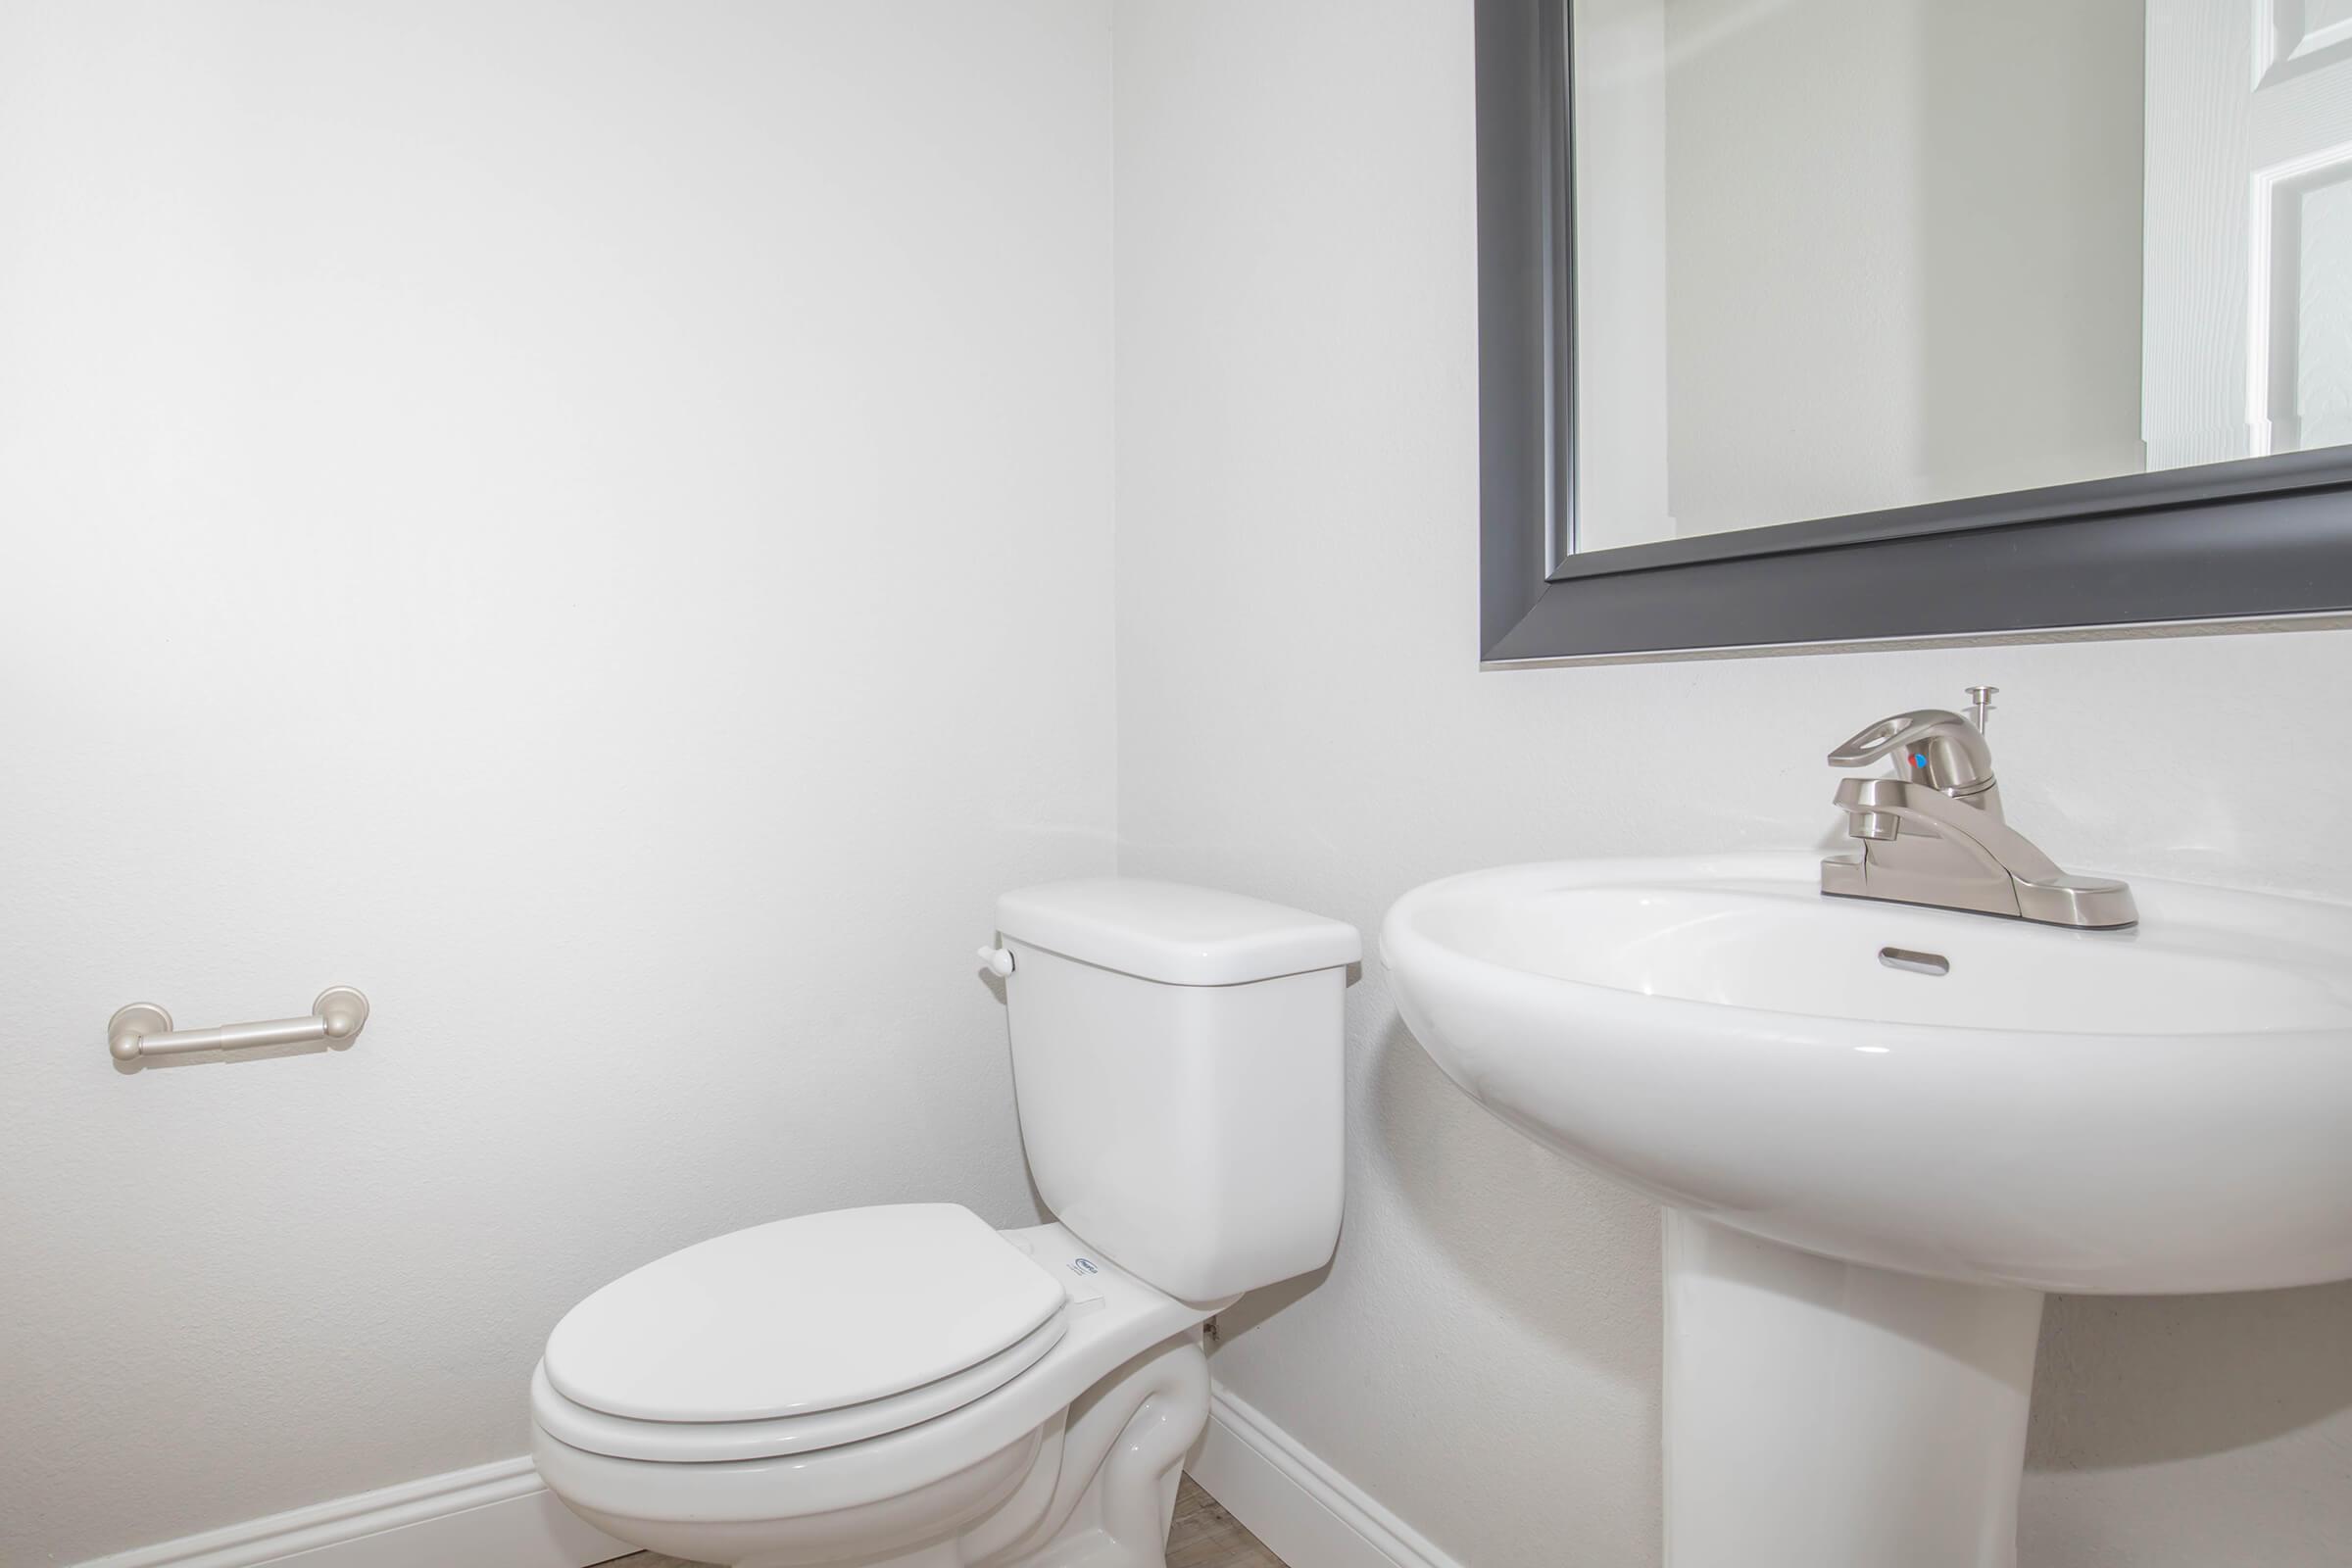 a white sink sitting next to a window